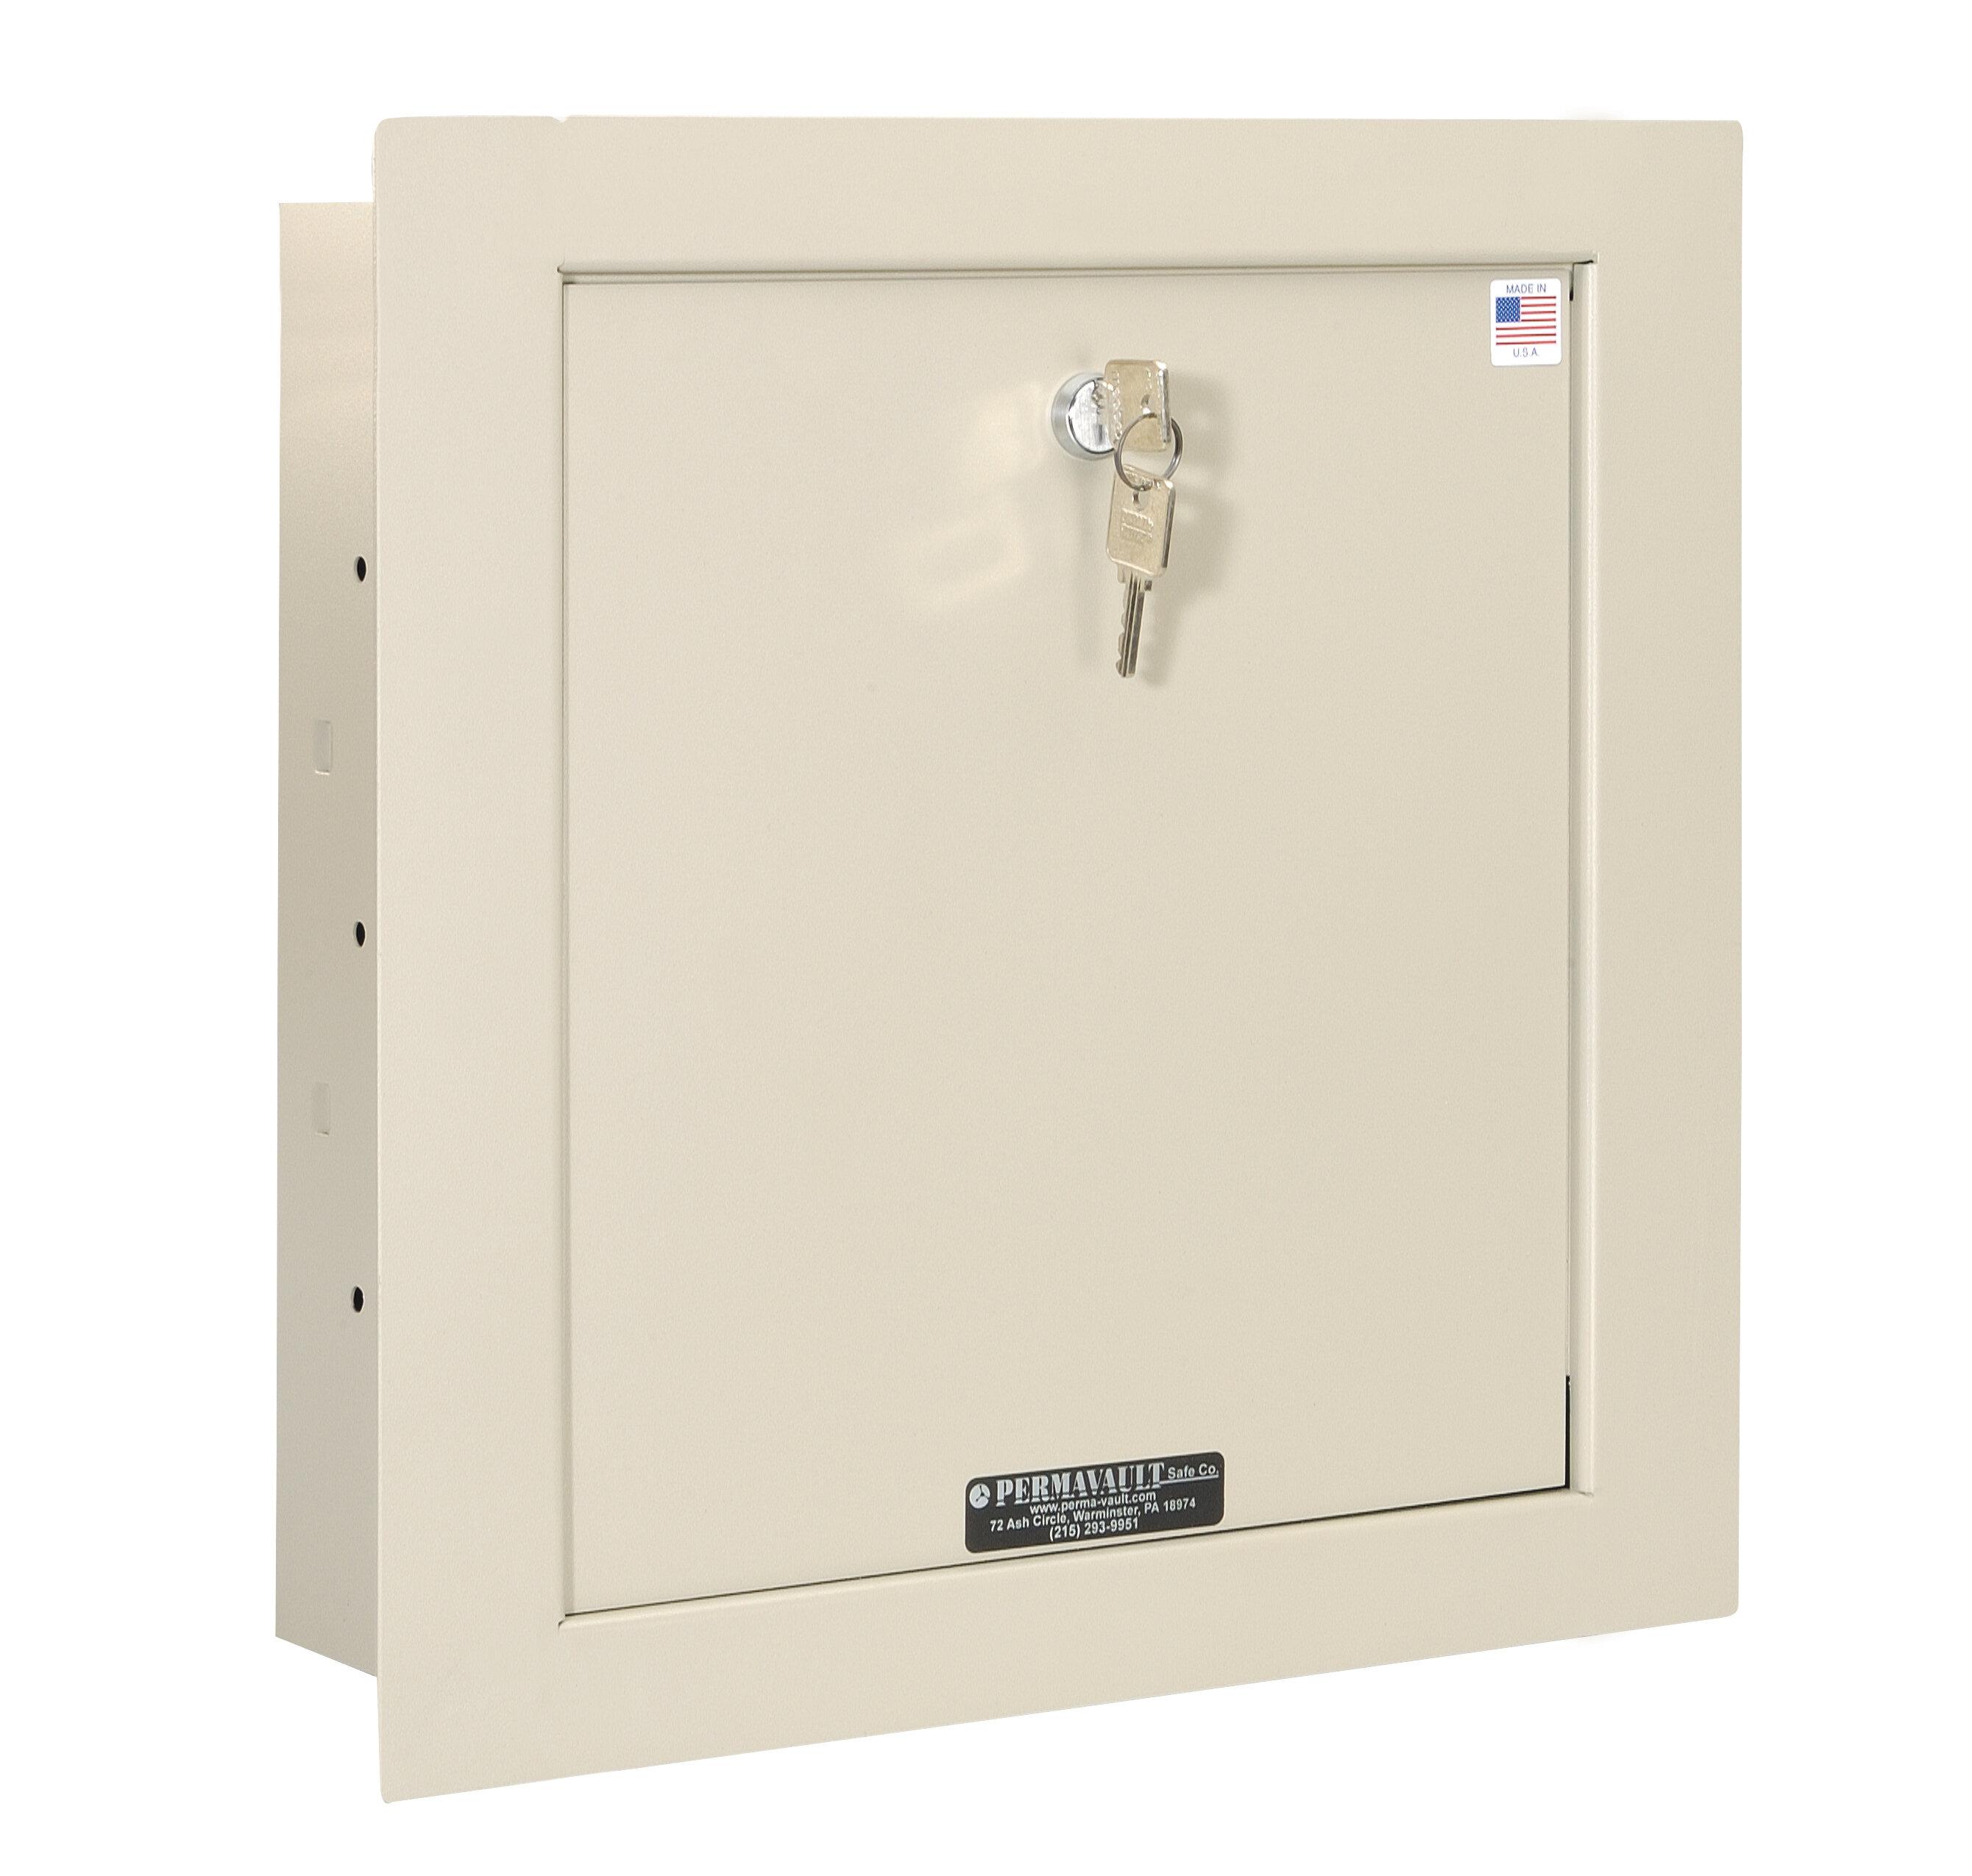 Perma Vault Key Lock Commercial Wall Safe 47 Cuft Wayfair